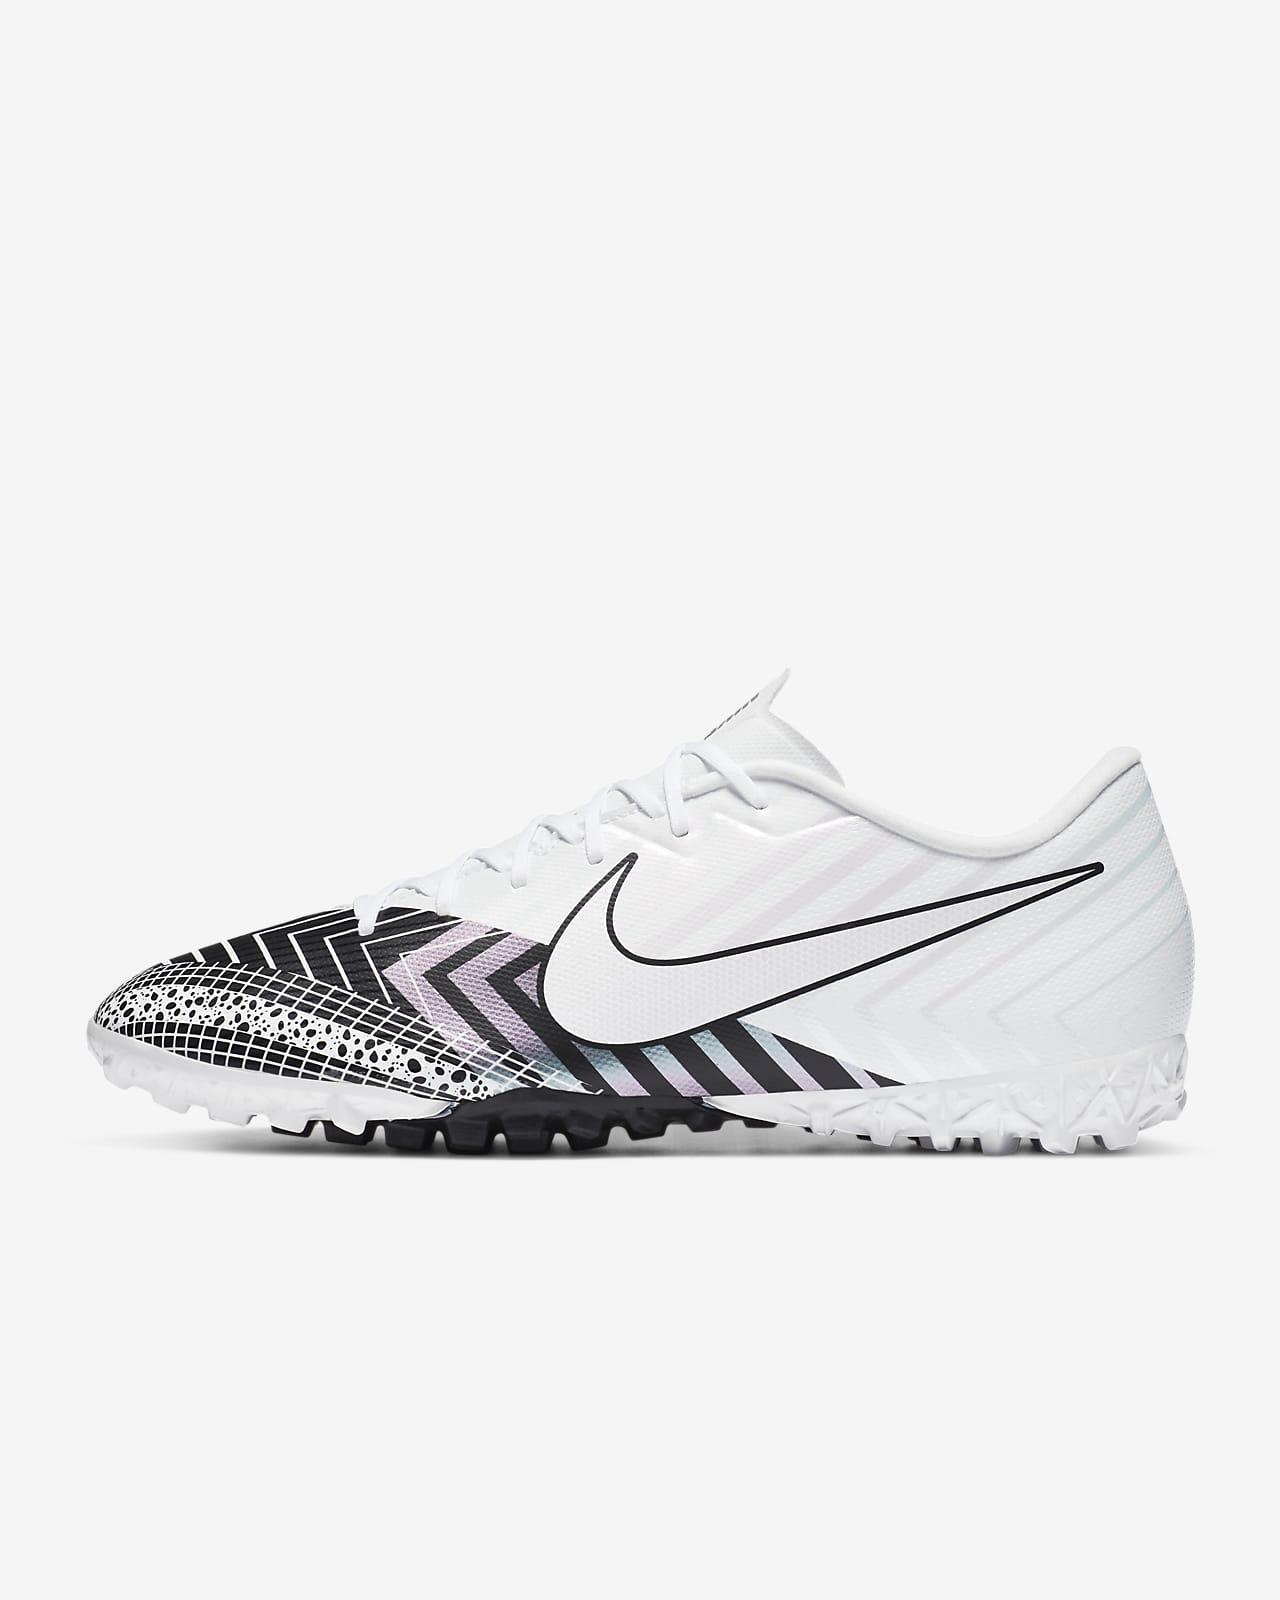 Nike Mercurial Vapor 13 Academy MDS TF 人工短草草皮足球鞋